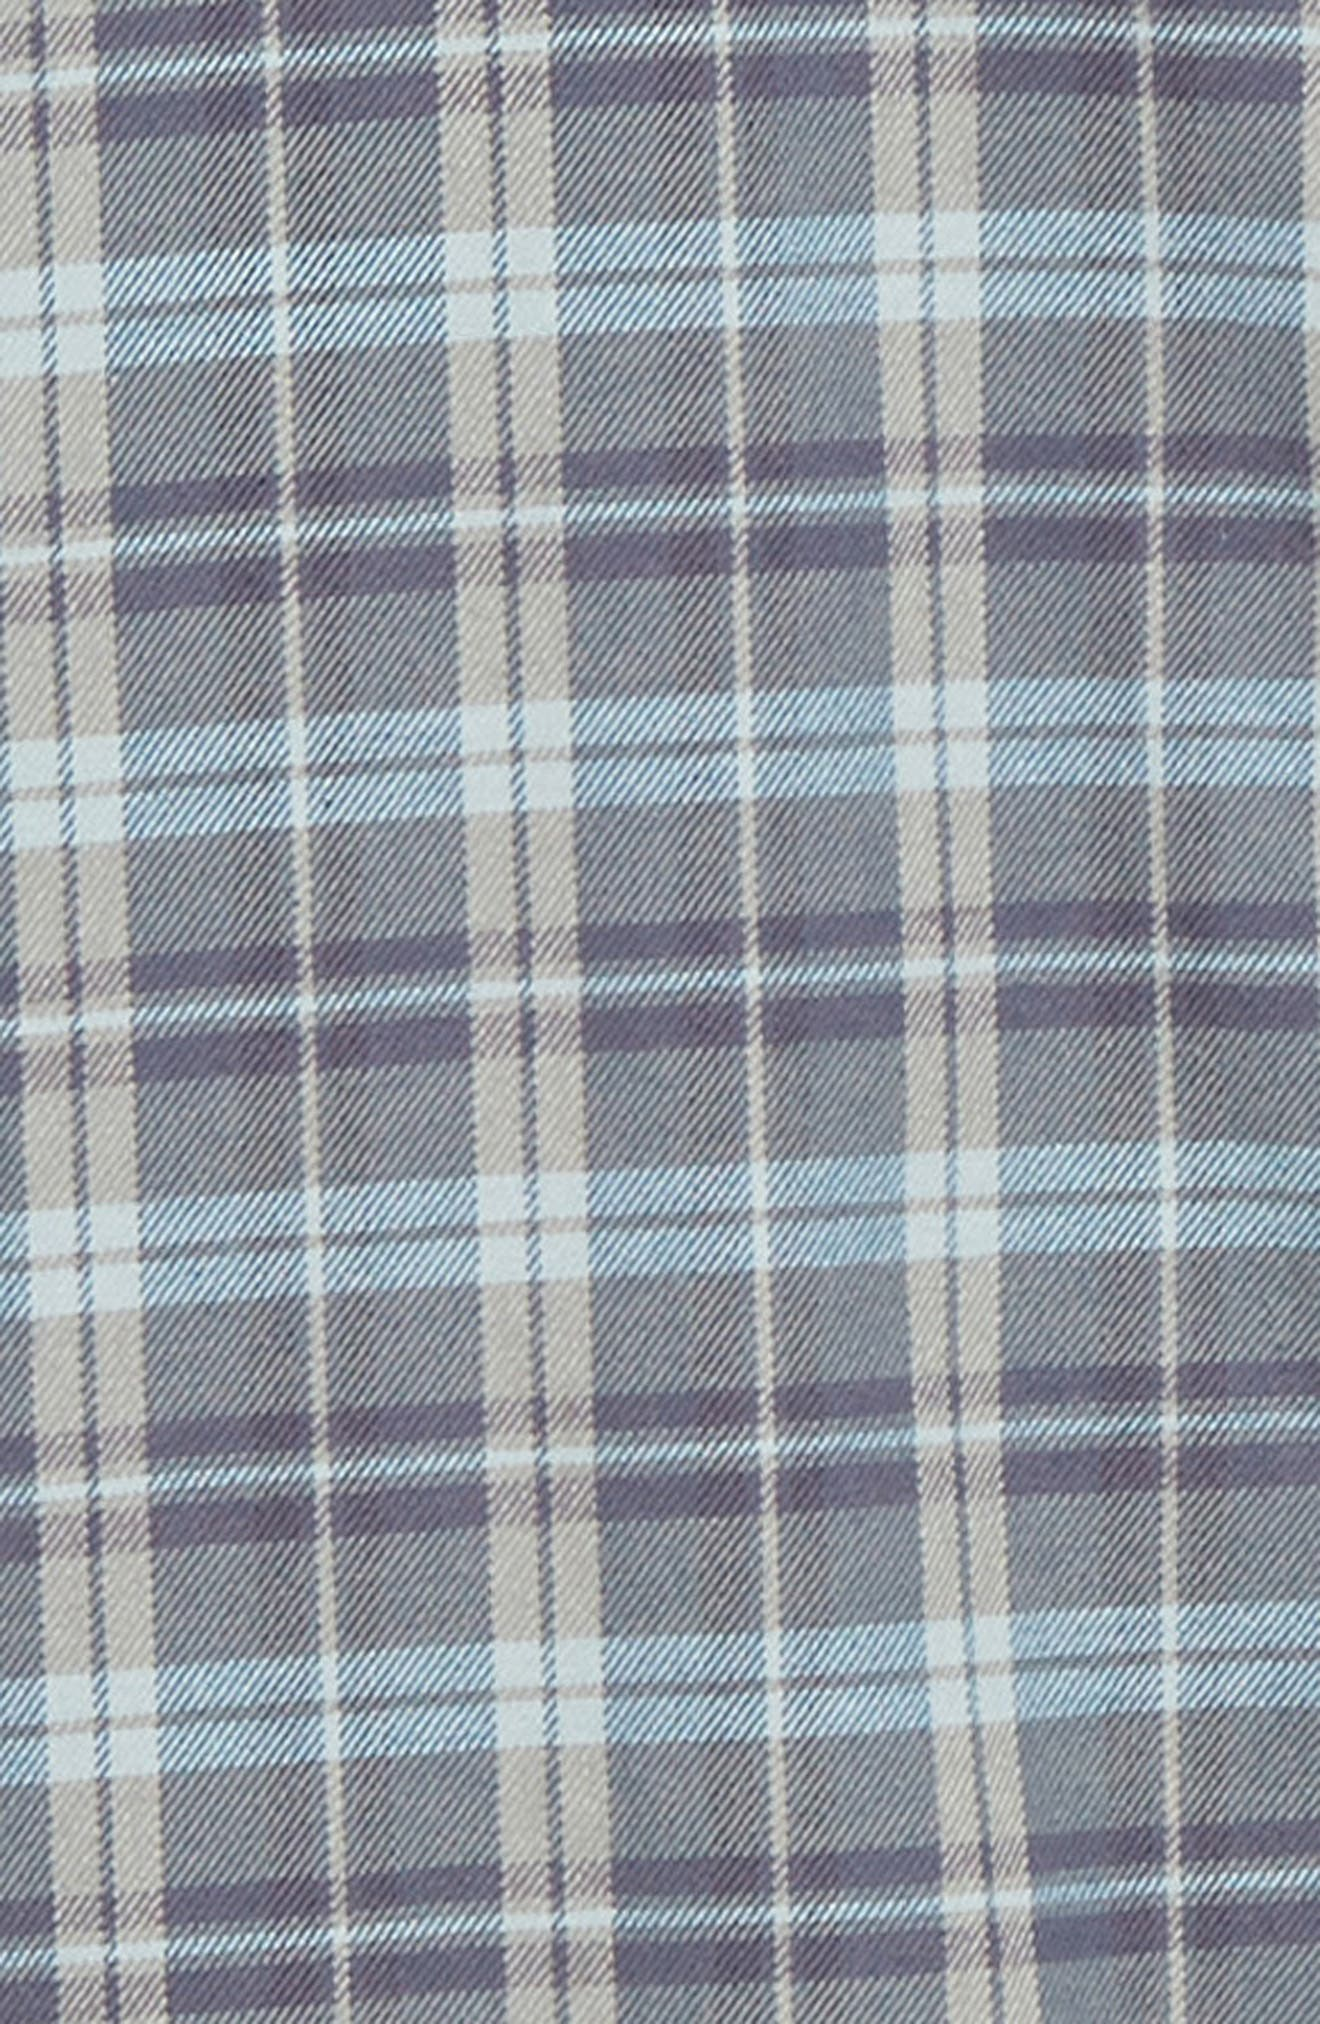 Seaview Stretch Flannel Shirt,                             Alternate thumbnail 6, color,                             DARK BLUE GREY